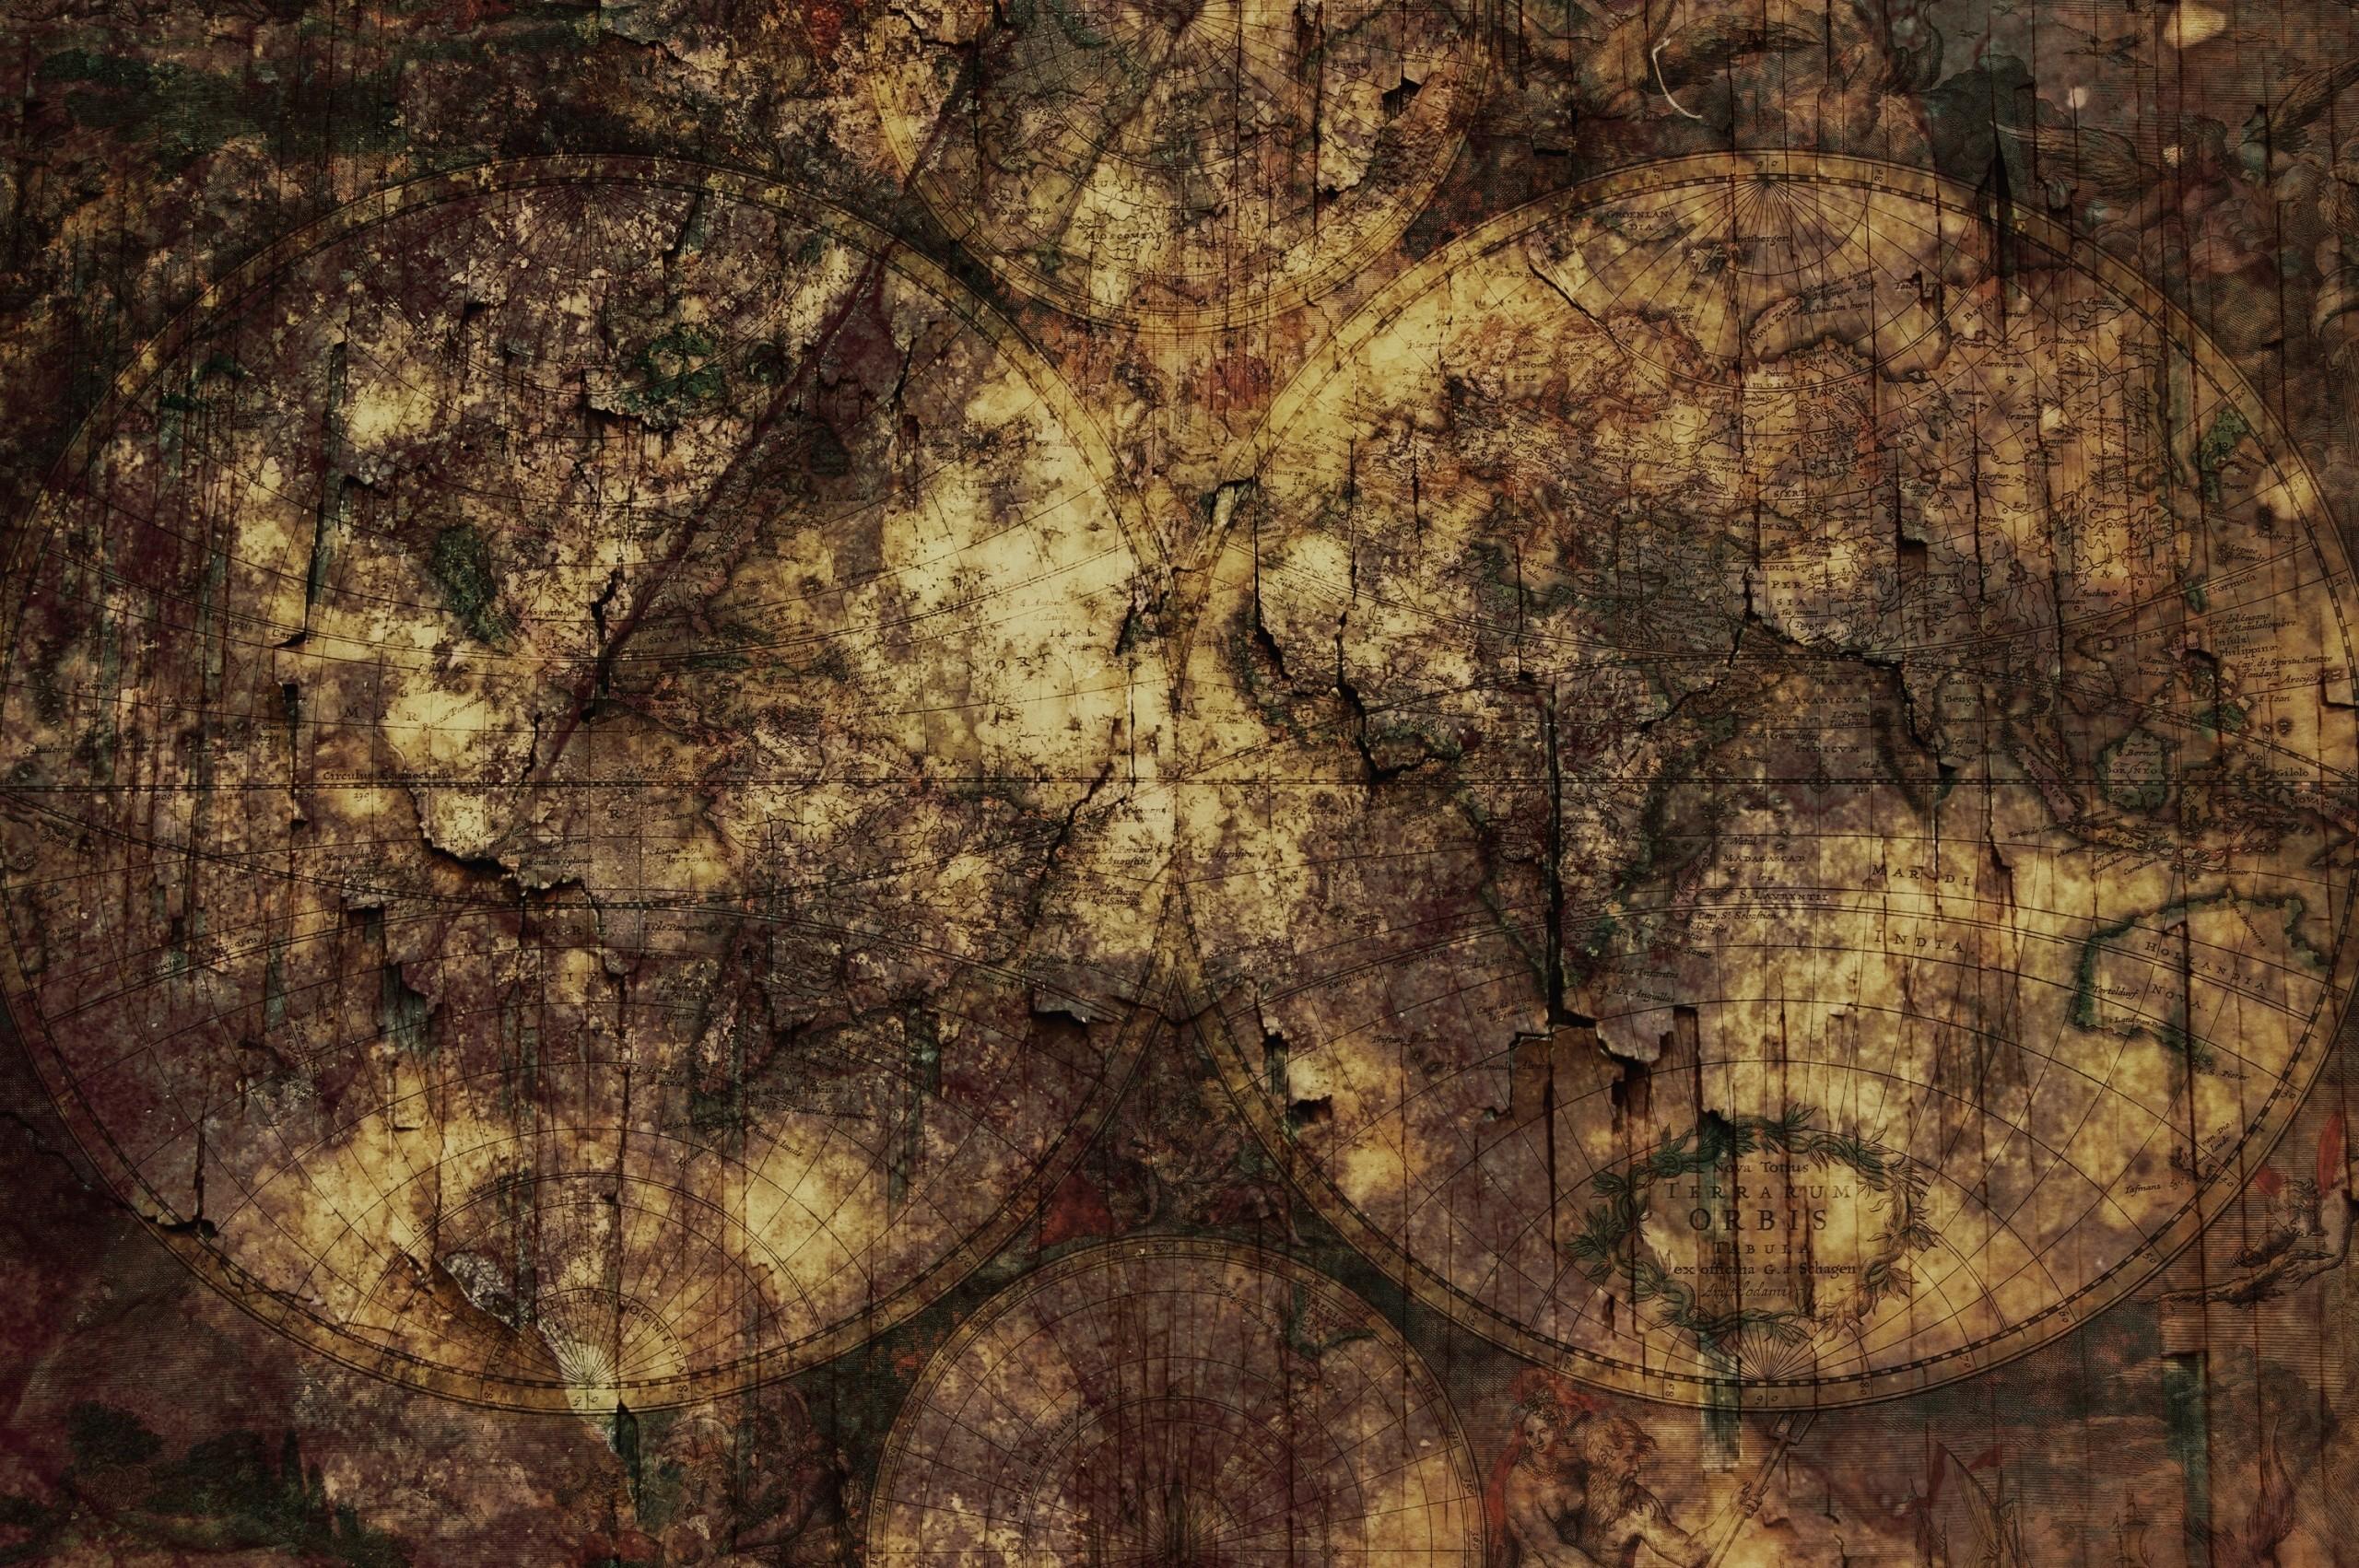 Old World Map Desktop Wallpaper Wallpapersafari .